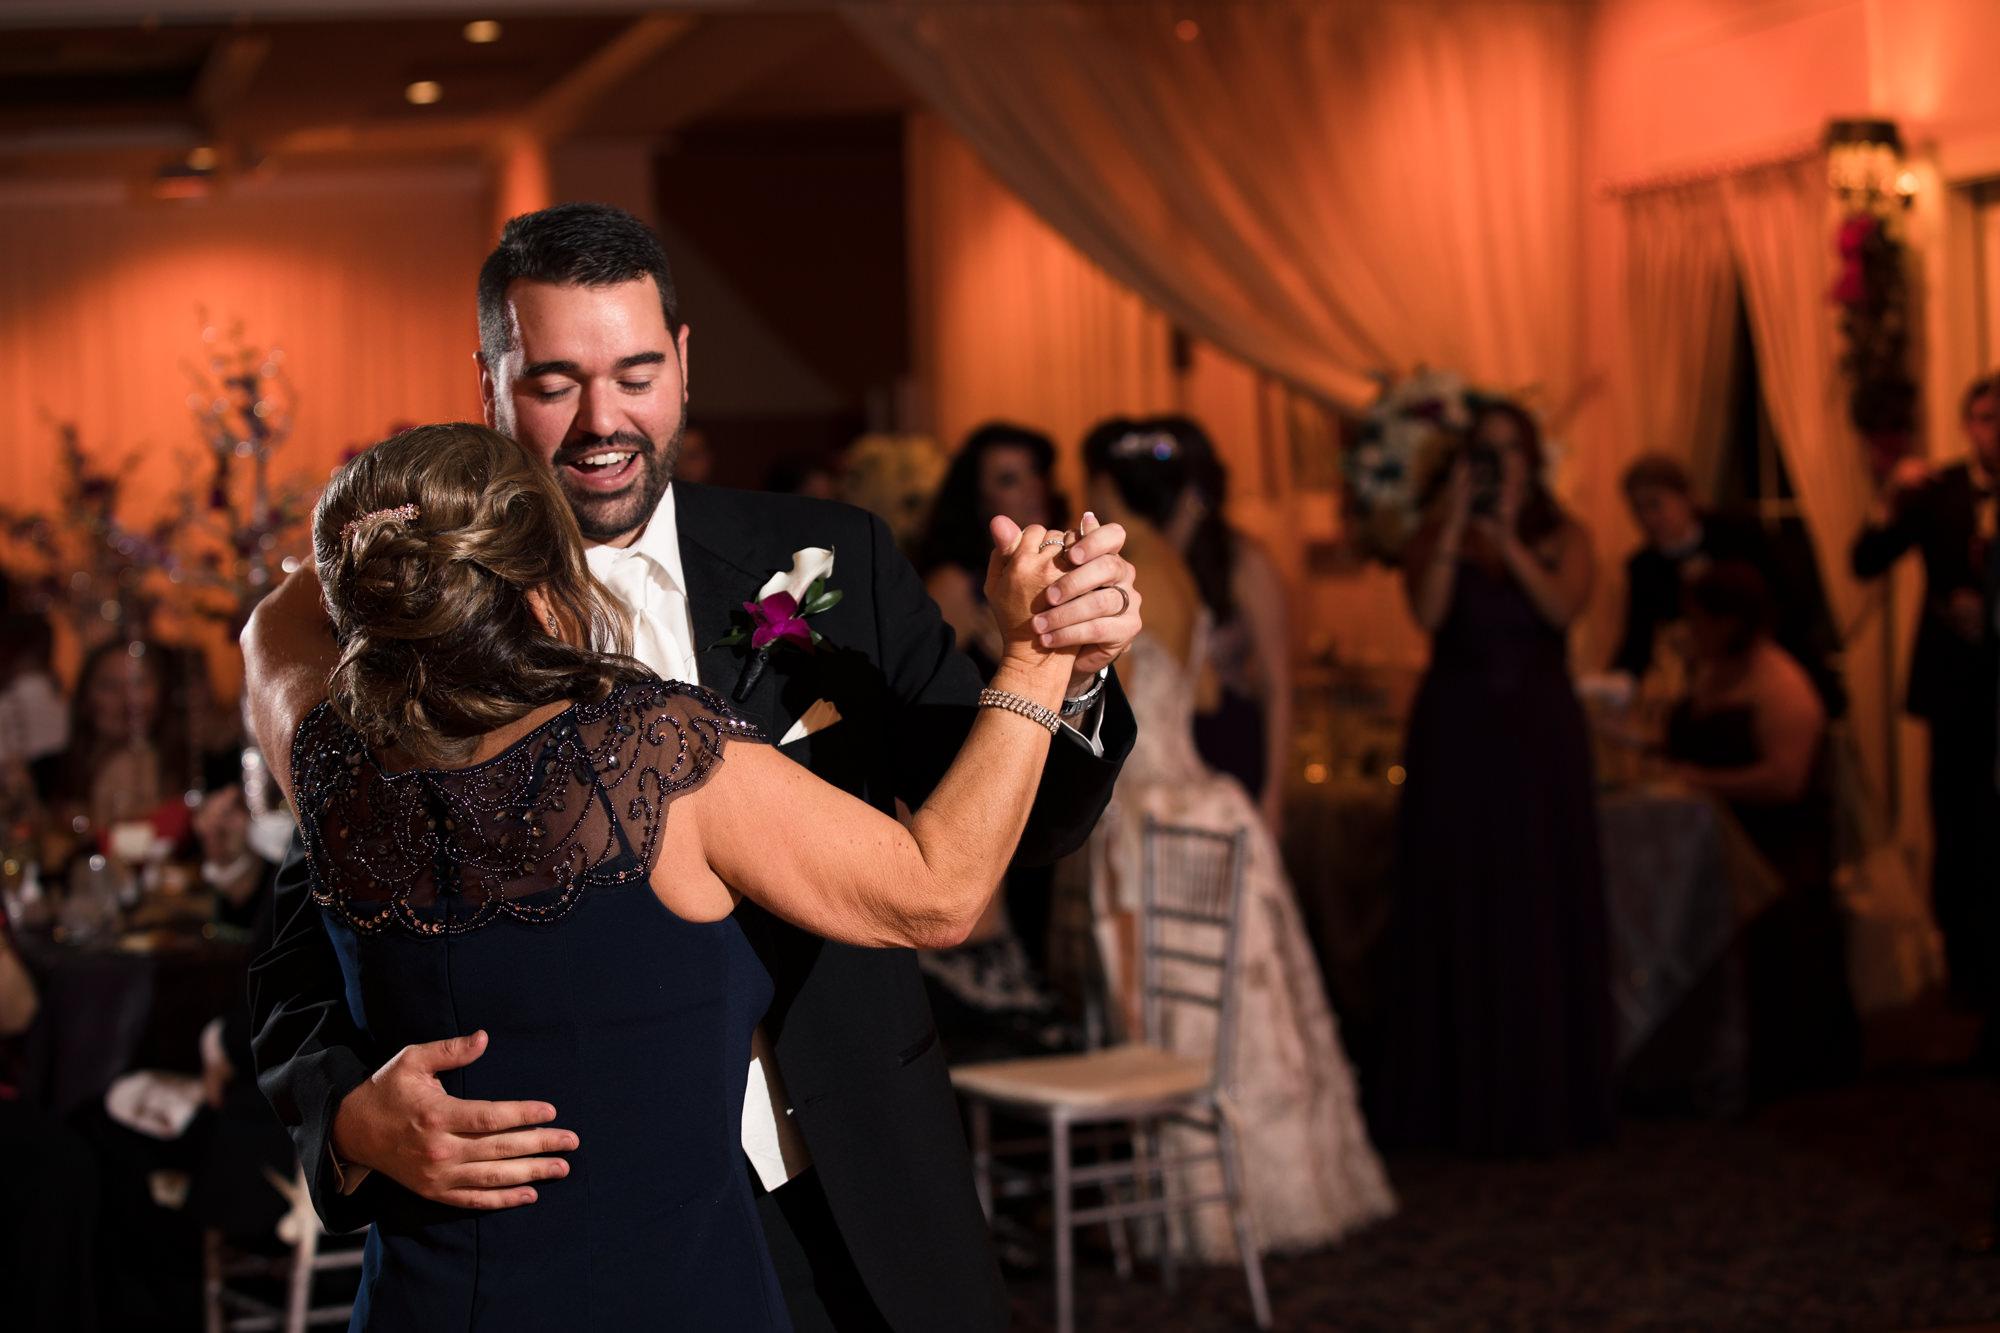 Benvenuto_Wedding_catholic_Florida_Bride-Groom-118.jpg